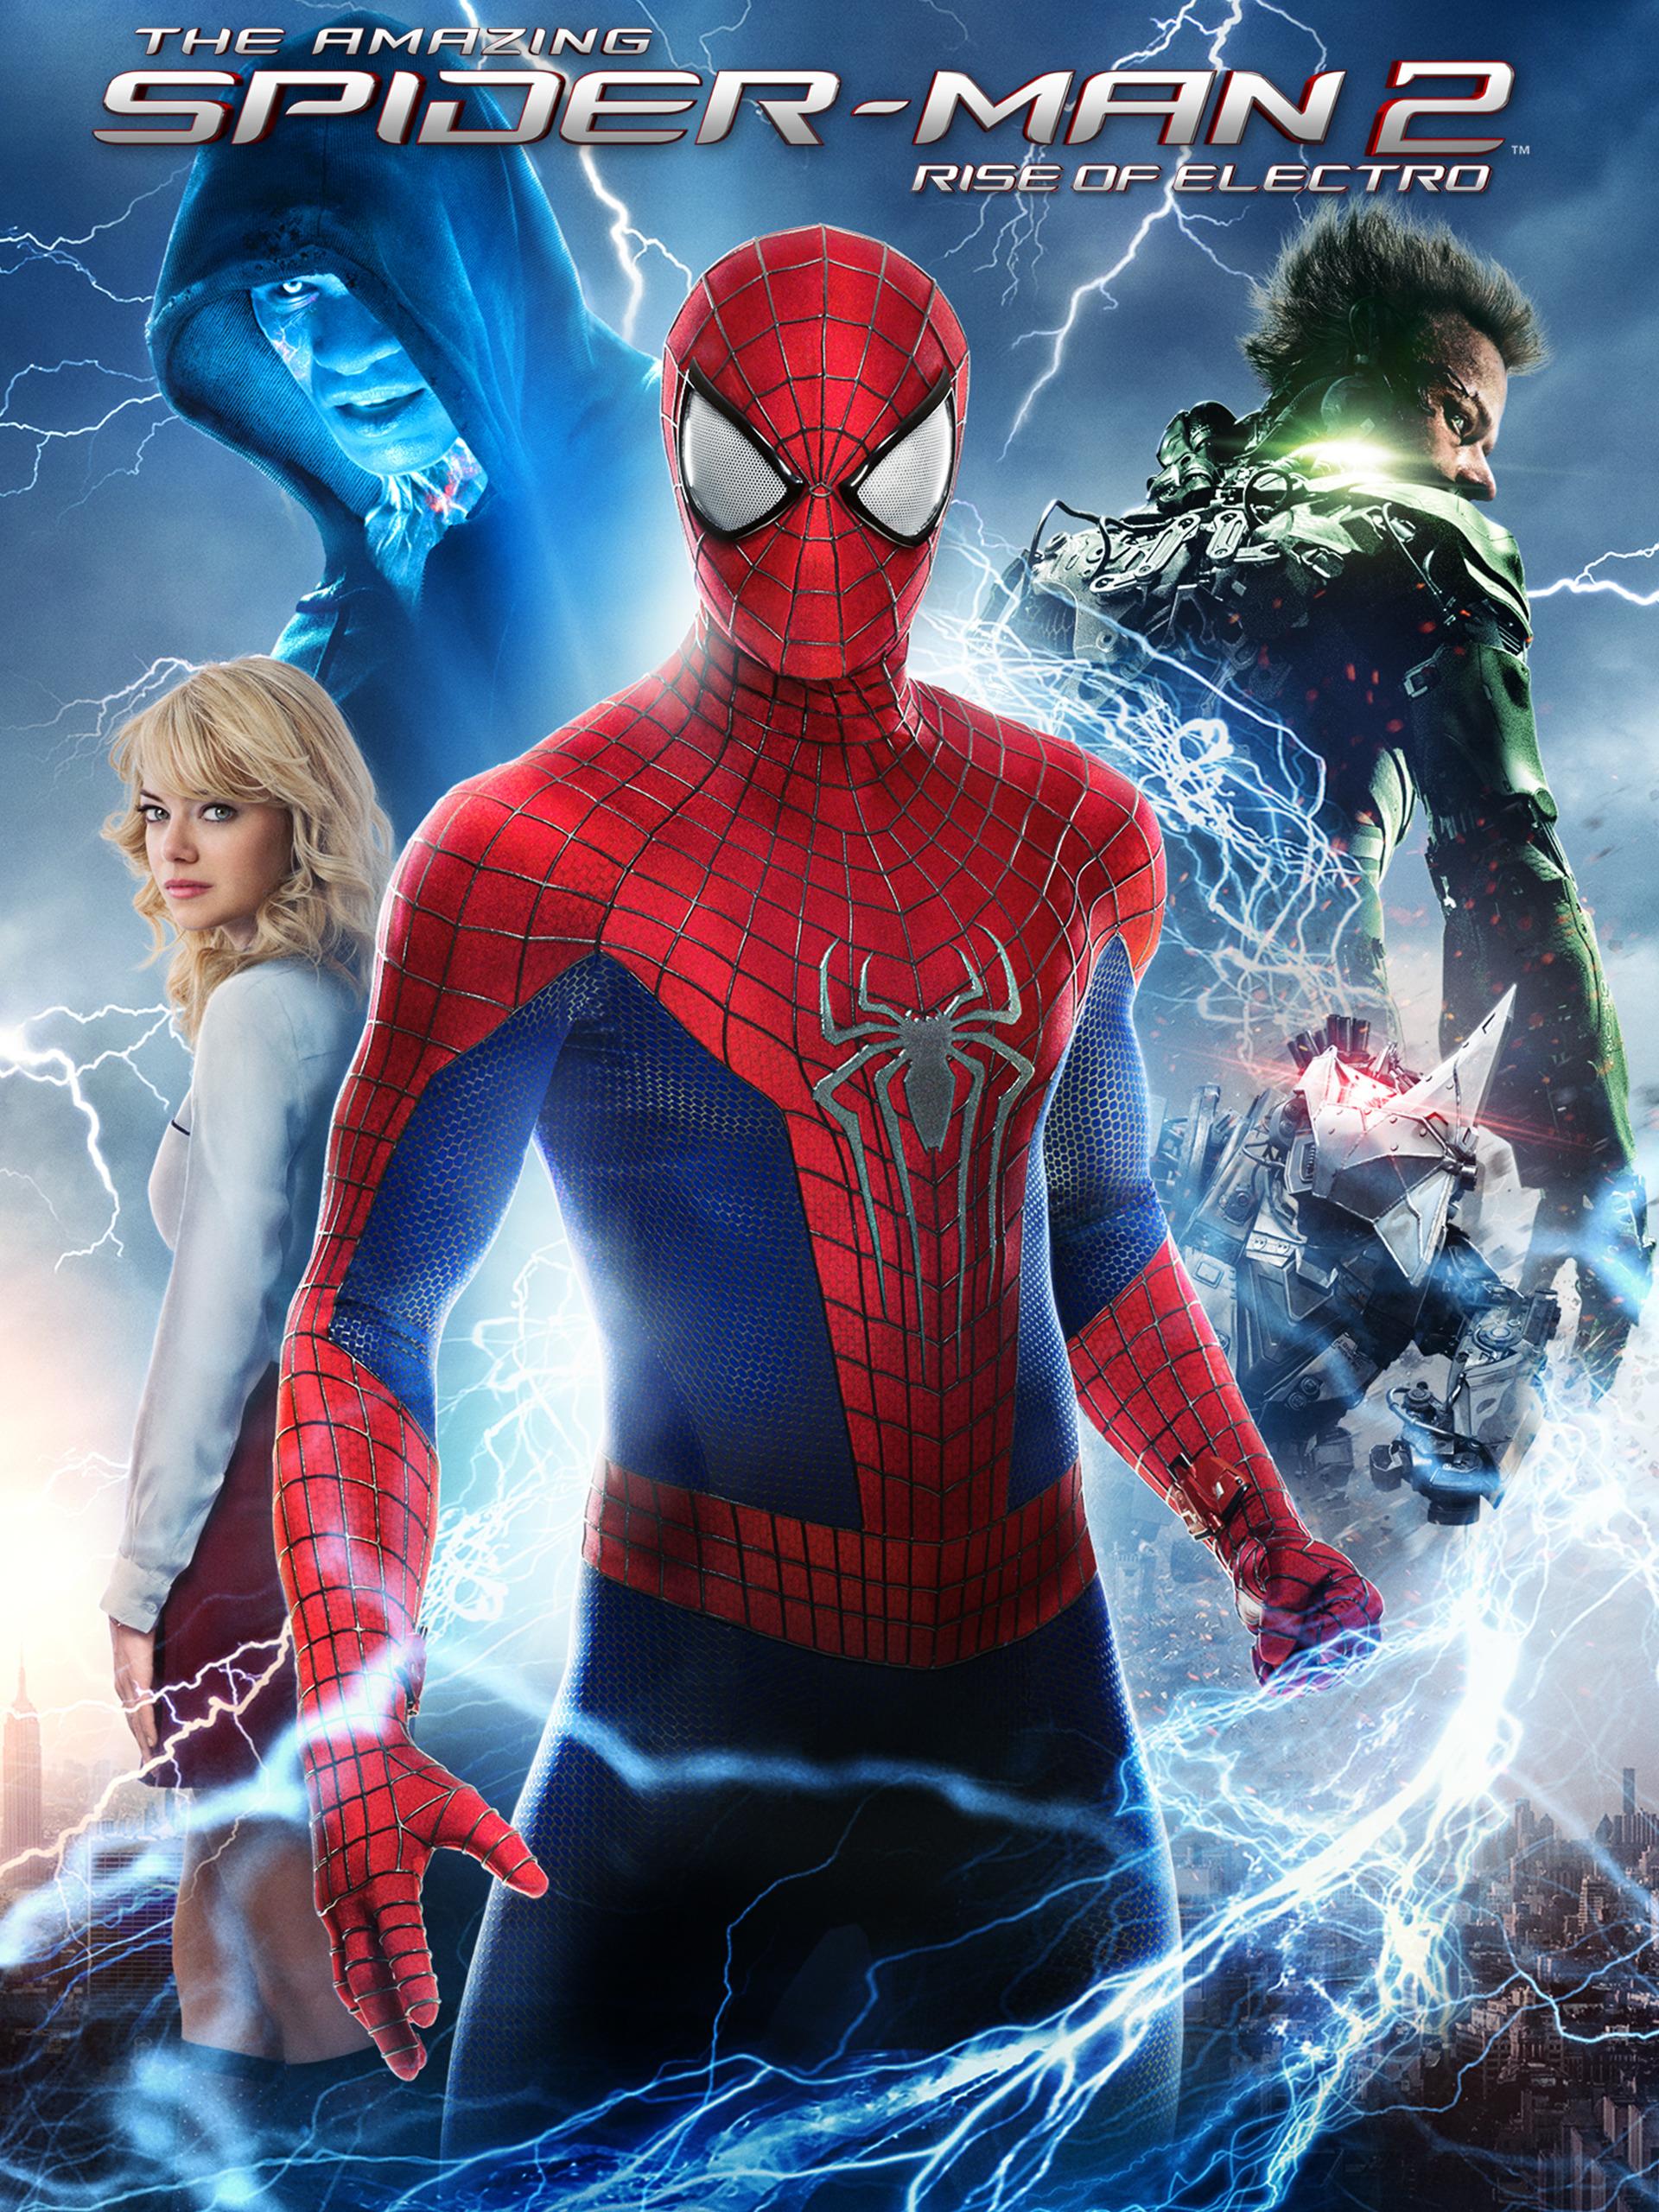 Prime Video: The Amazing Spider-Man 2